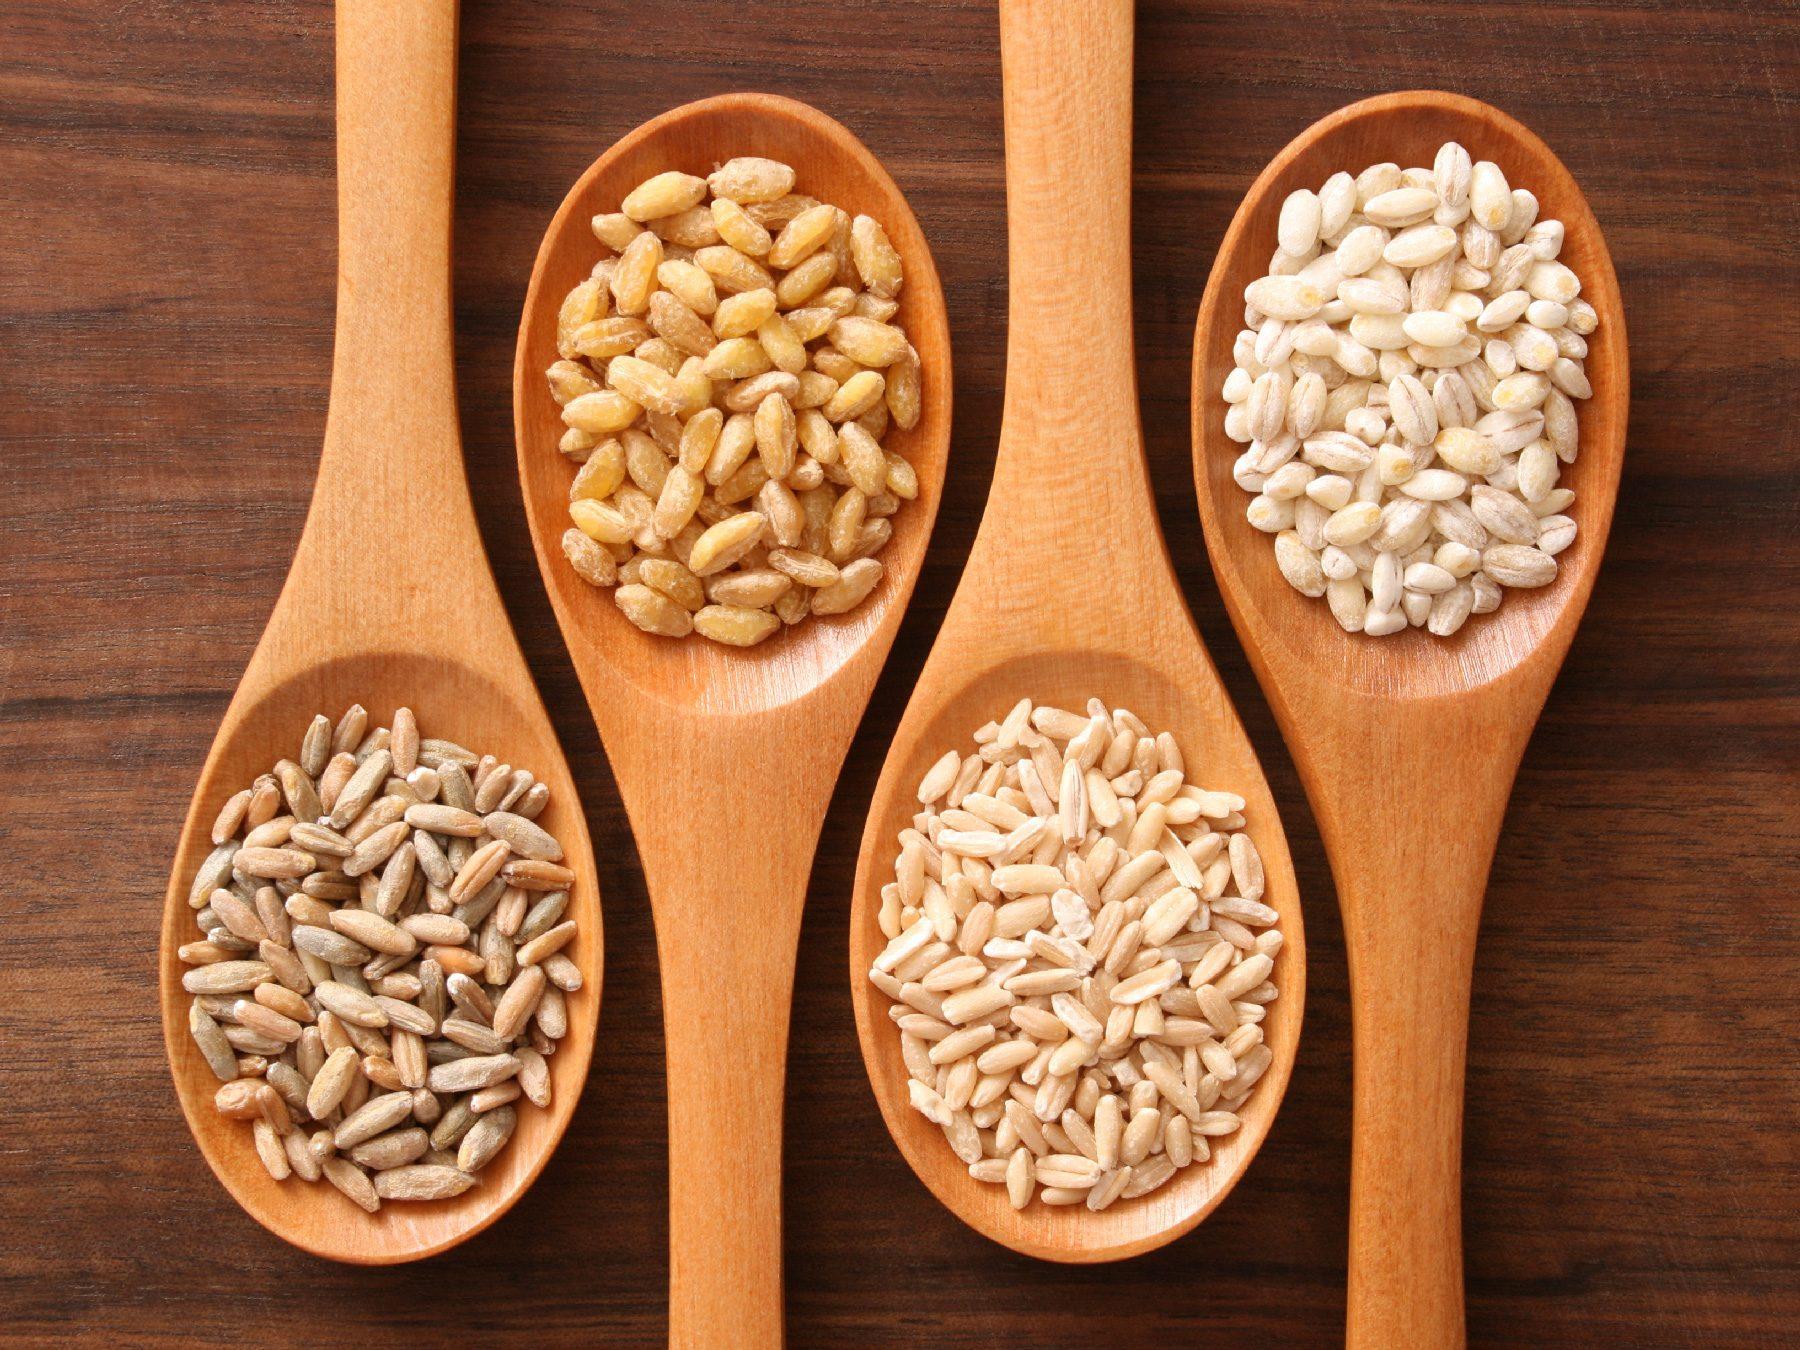 Focus on Whole Grains